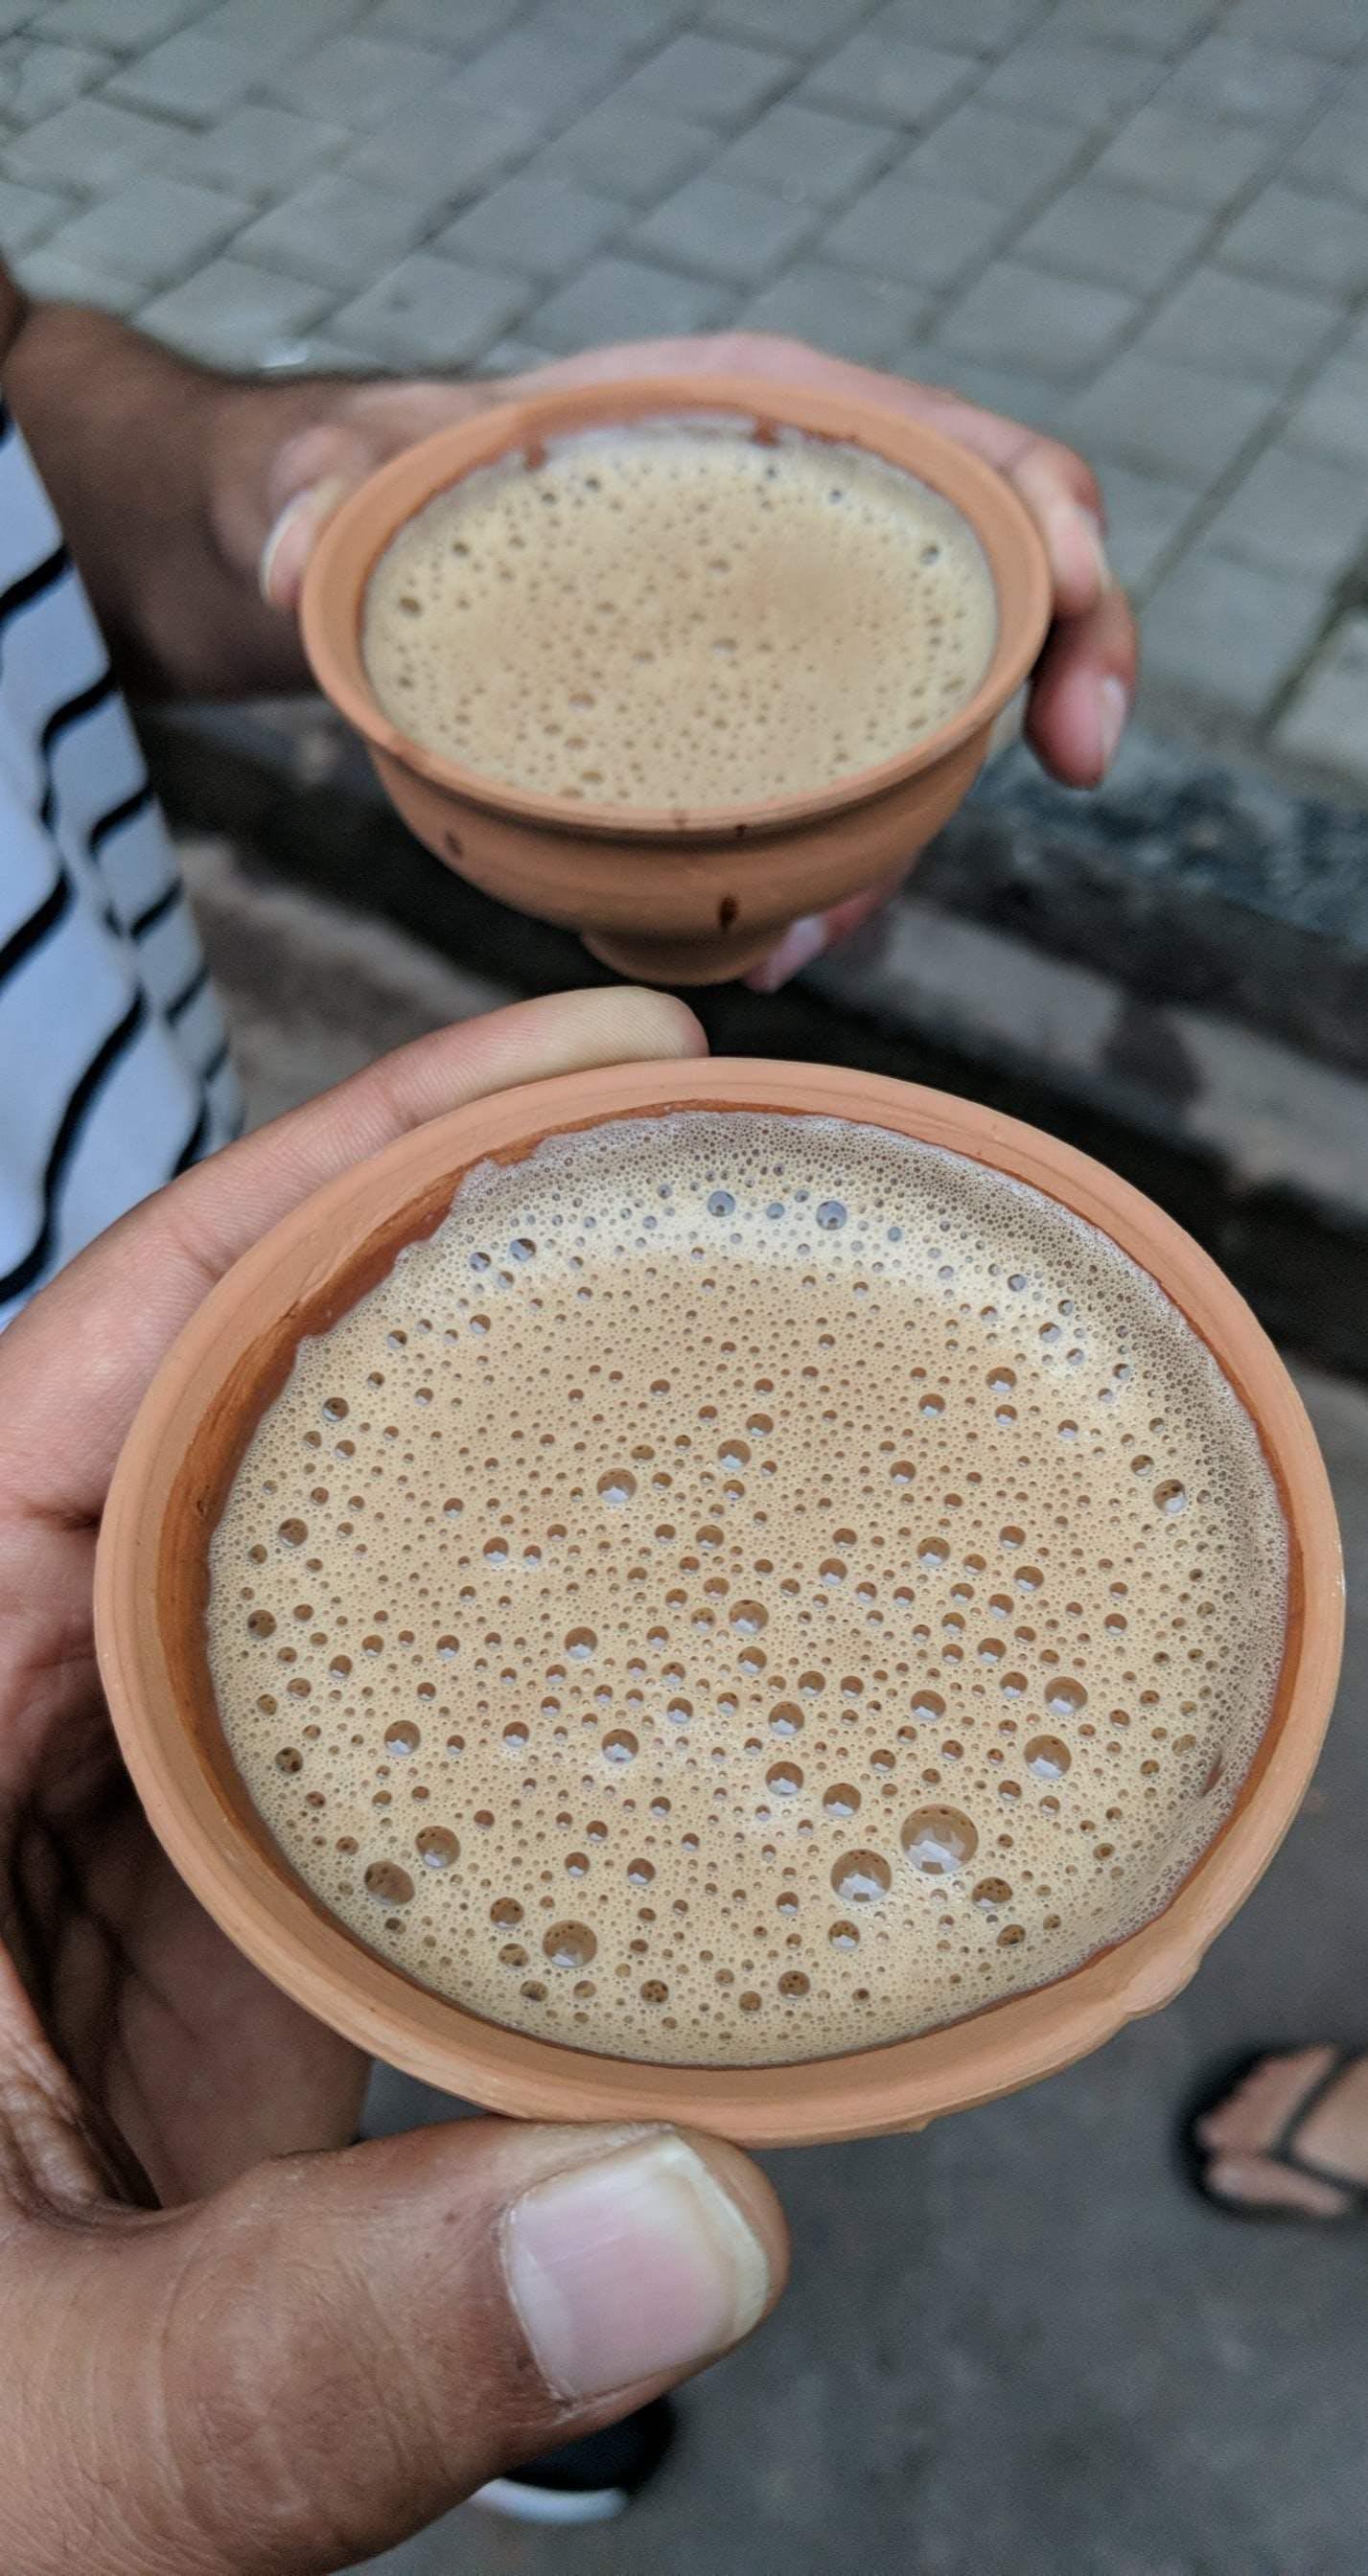 Food,Indian filter coffee,Cuisine,Milk punch,Drink,Champurrado,Dish,Recipe,Ipoh white coffee,Ingredient